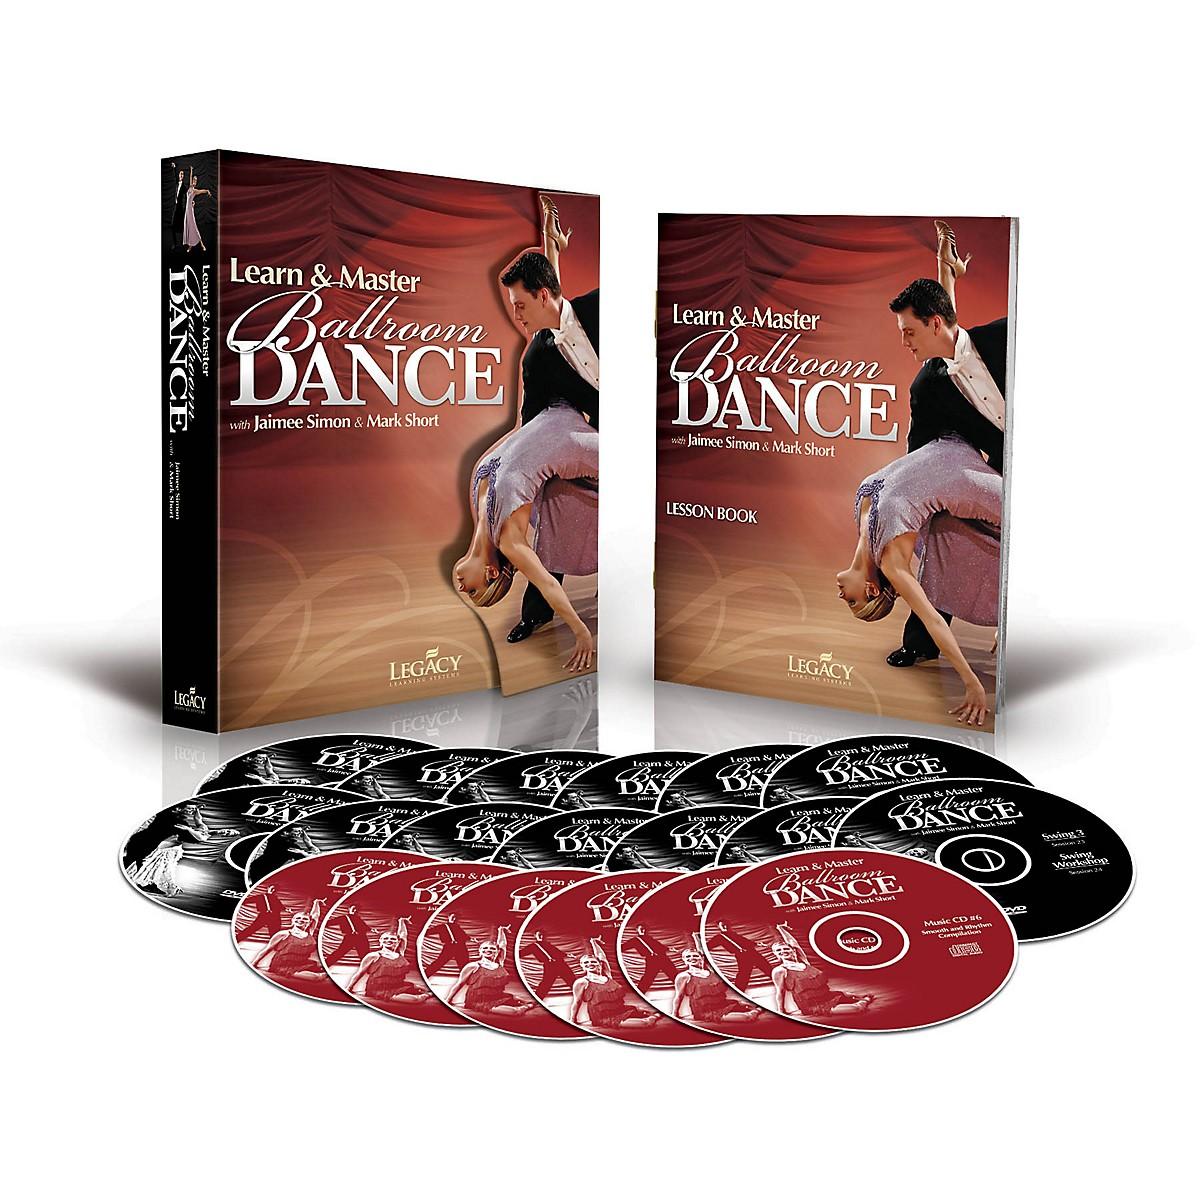 Legacy Learning Learn & Master Ballroom Dancing DVD Series